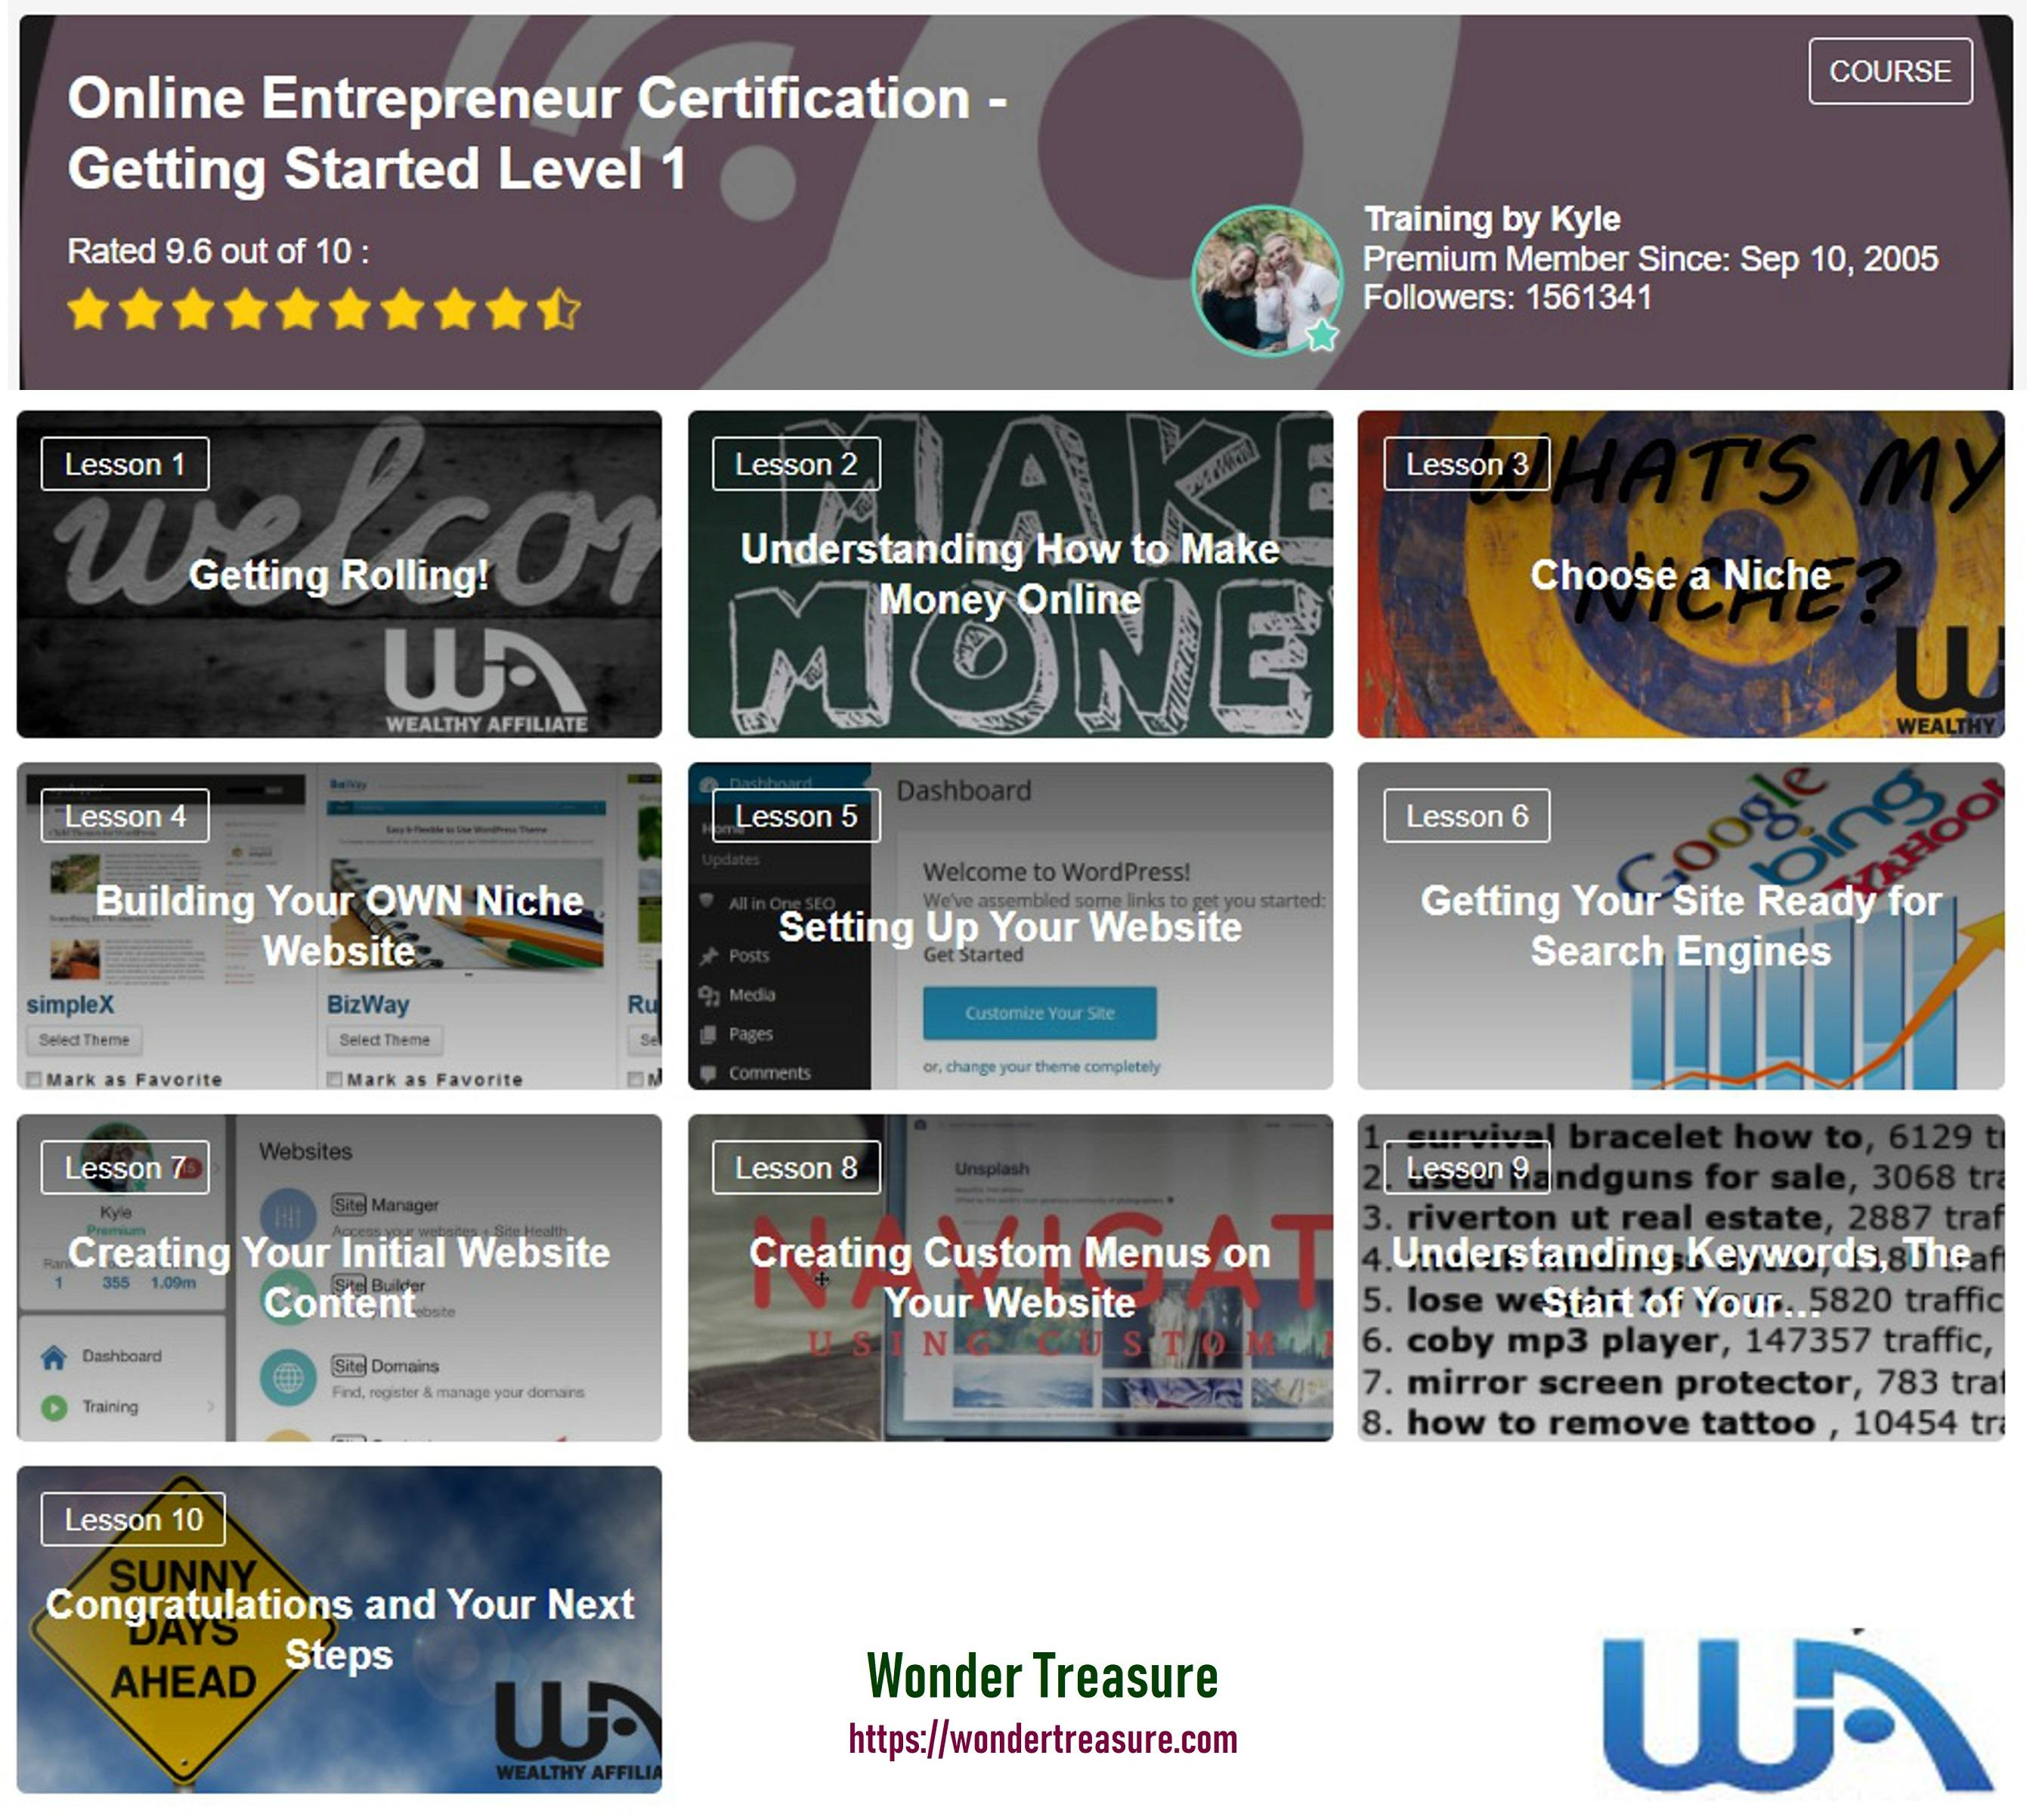 Let get it started - entrepreneur courses